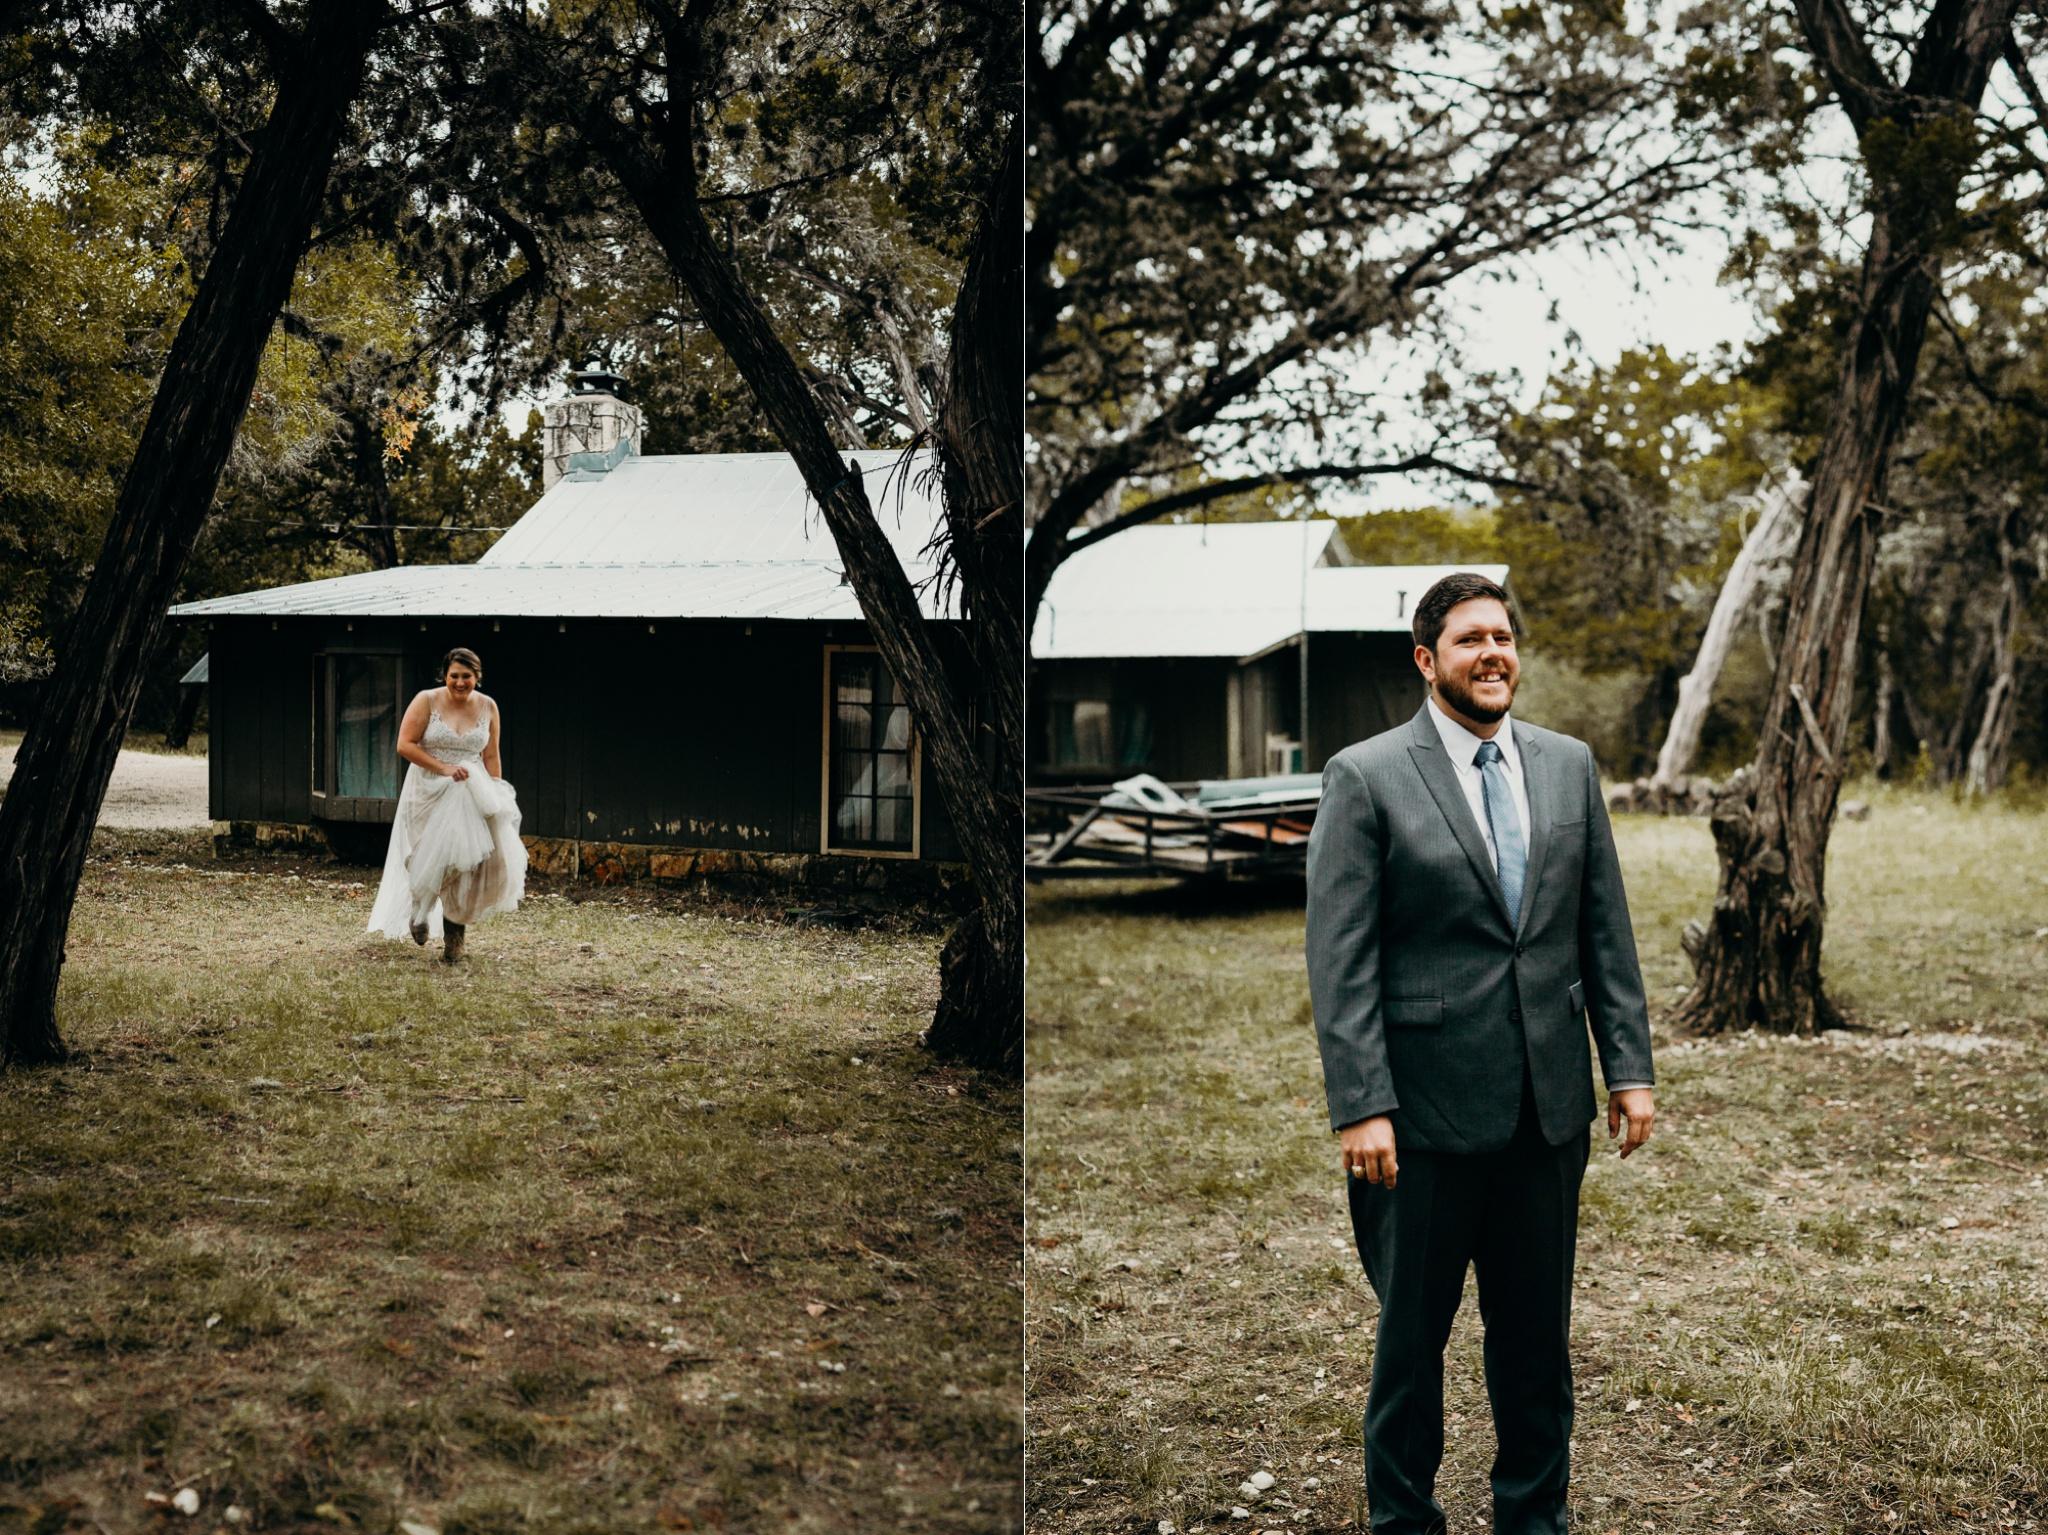 Carlson_Wedding_KaliMikelle-20.jpg